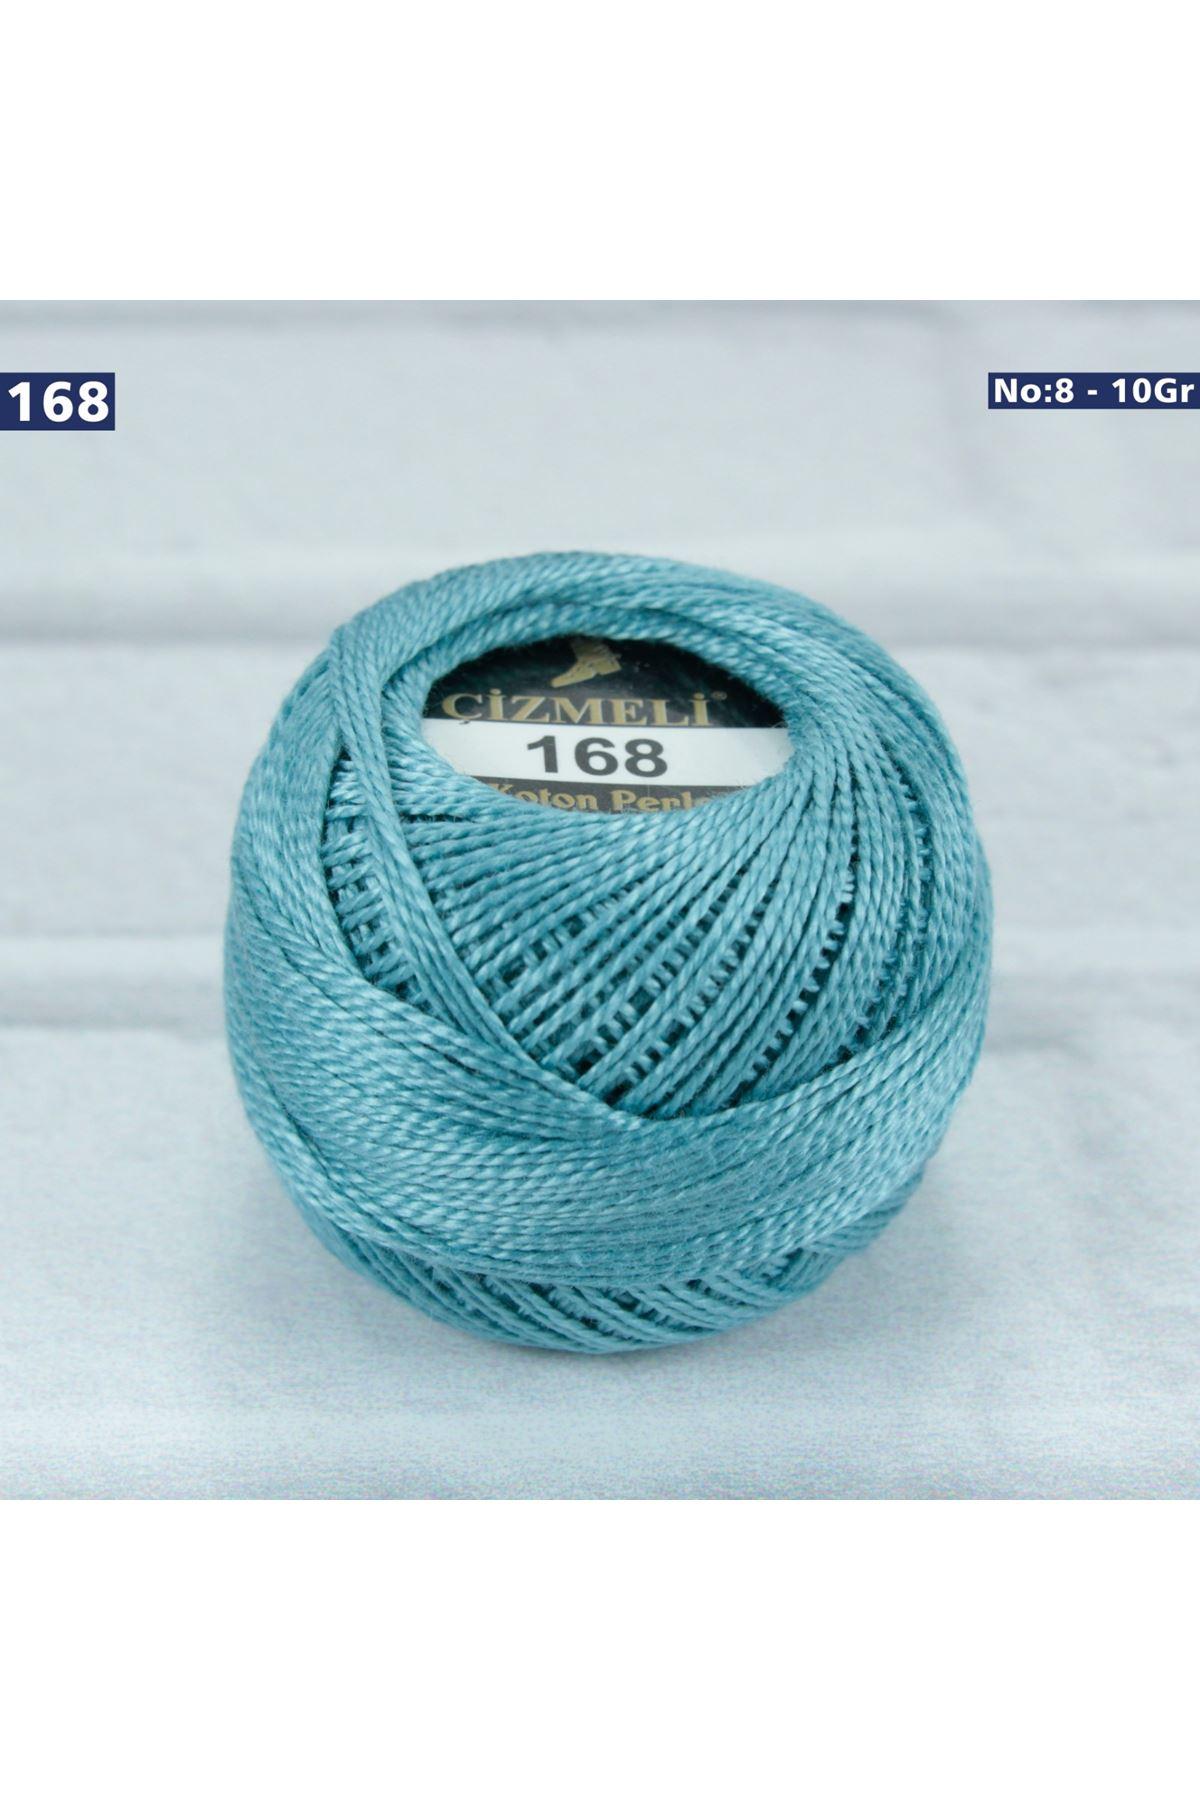 Çizmeli Cotton Perle Nakış İpliği No: 168